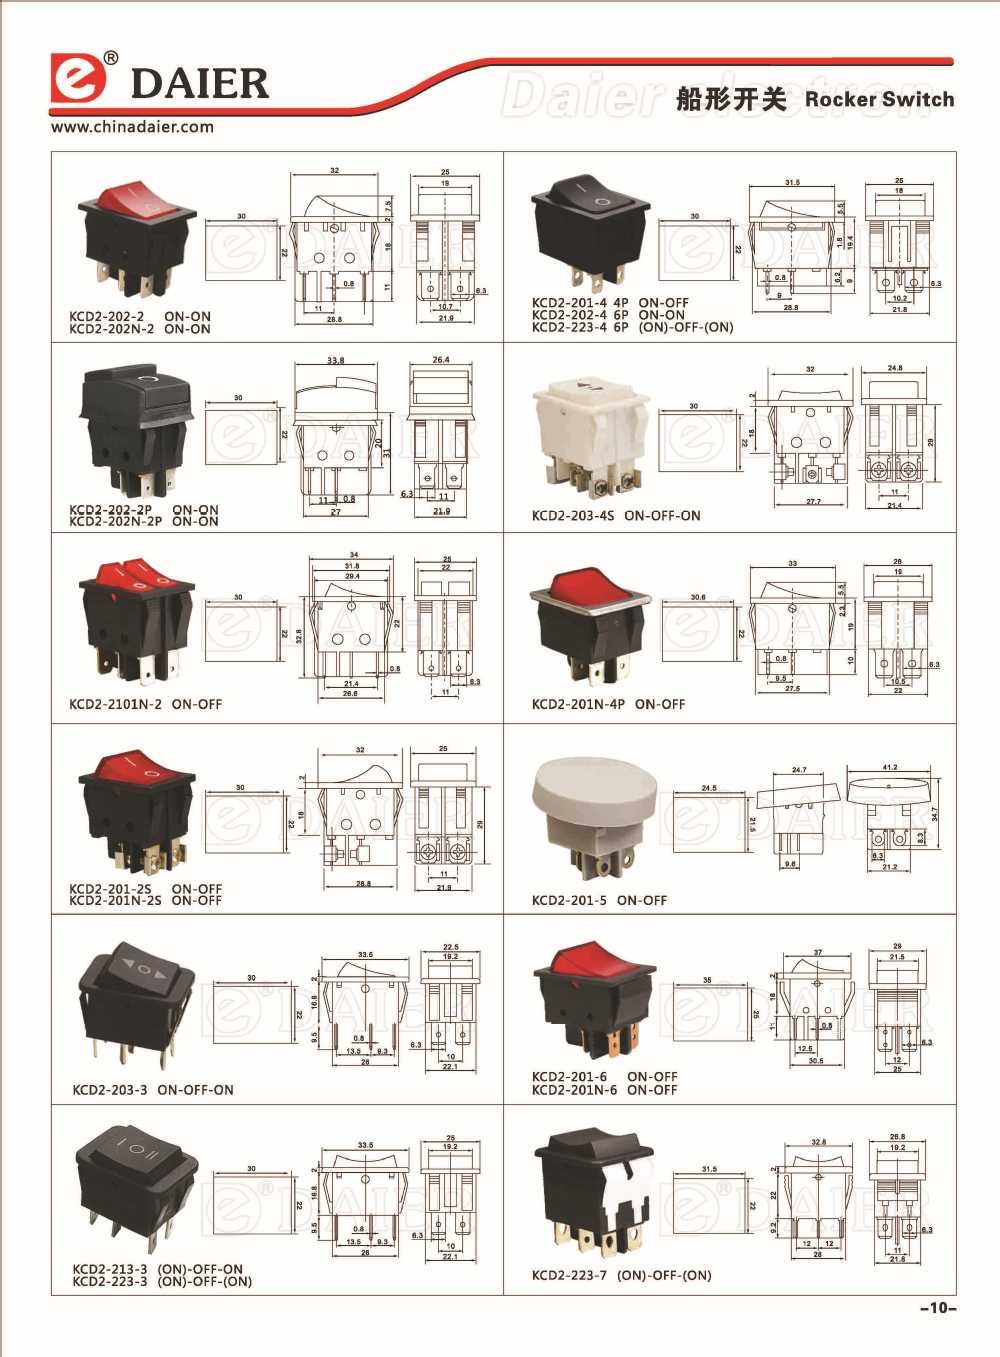 medium resolution of 4 pin rocker switch wiring diagram daier 4 pins rocker switch t120 buy